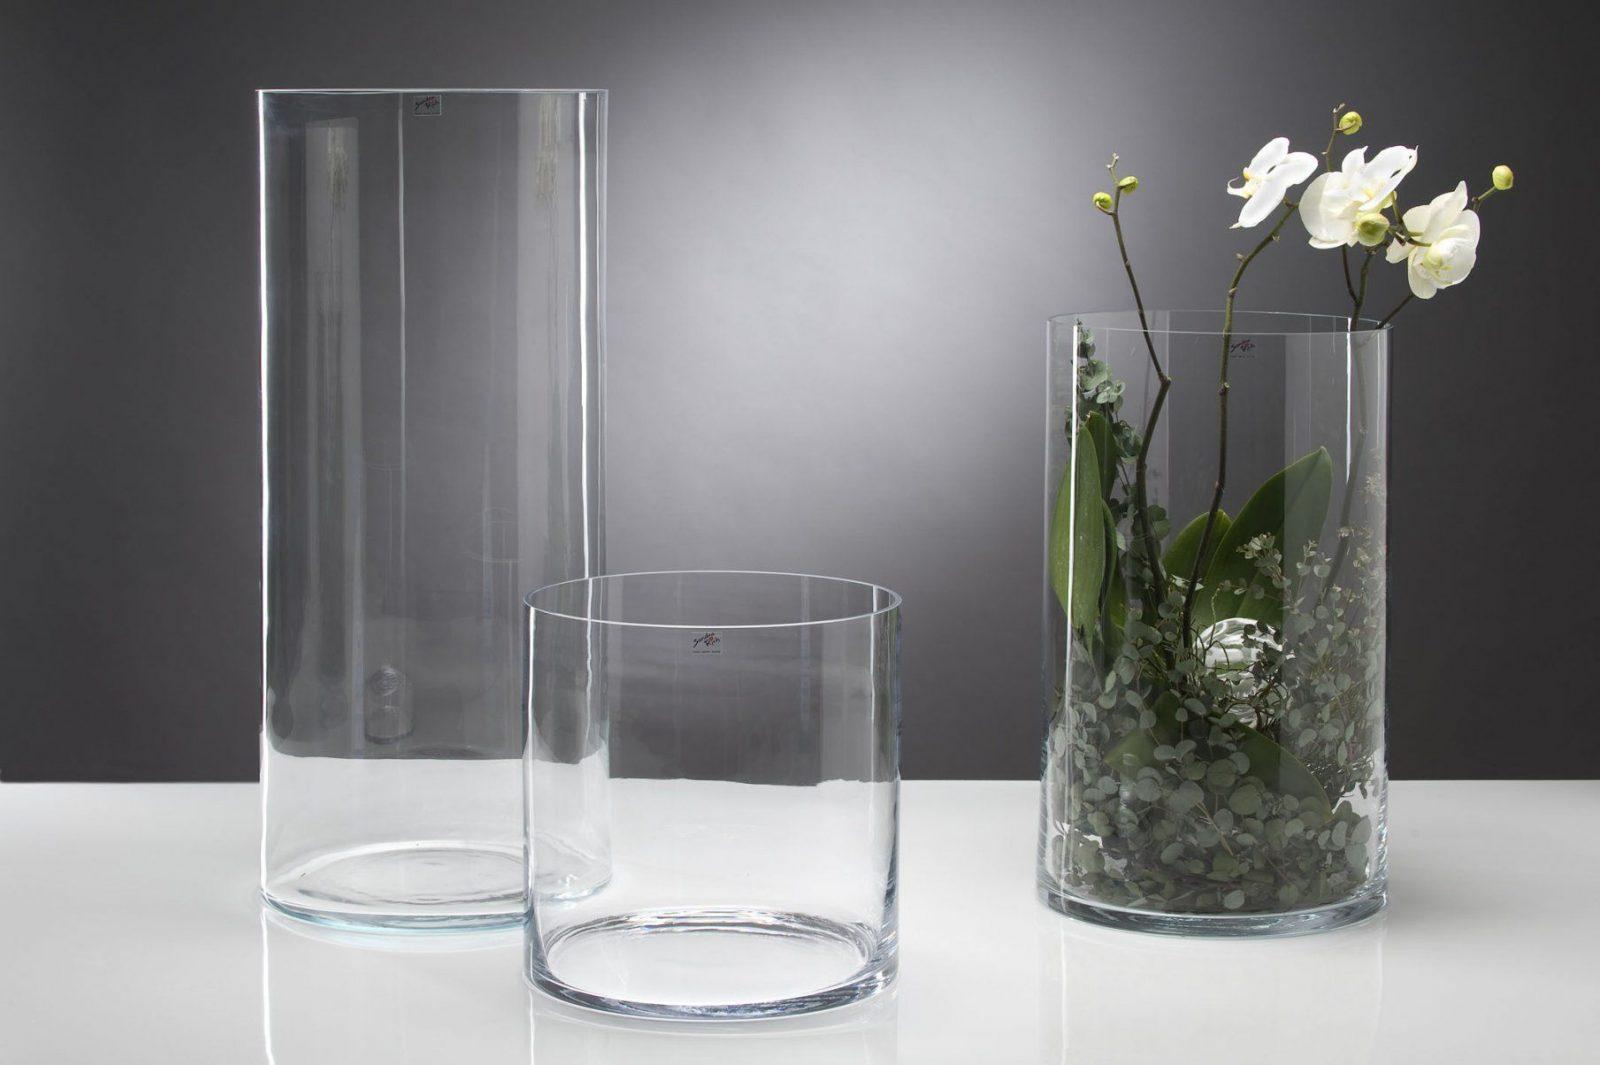 Hohe Glasvase Dekorieren Ideen Avec Bodenvase Dekorieren Frühling Et von Hohe Glasvase Dekorieren Ideen Photo